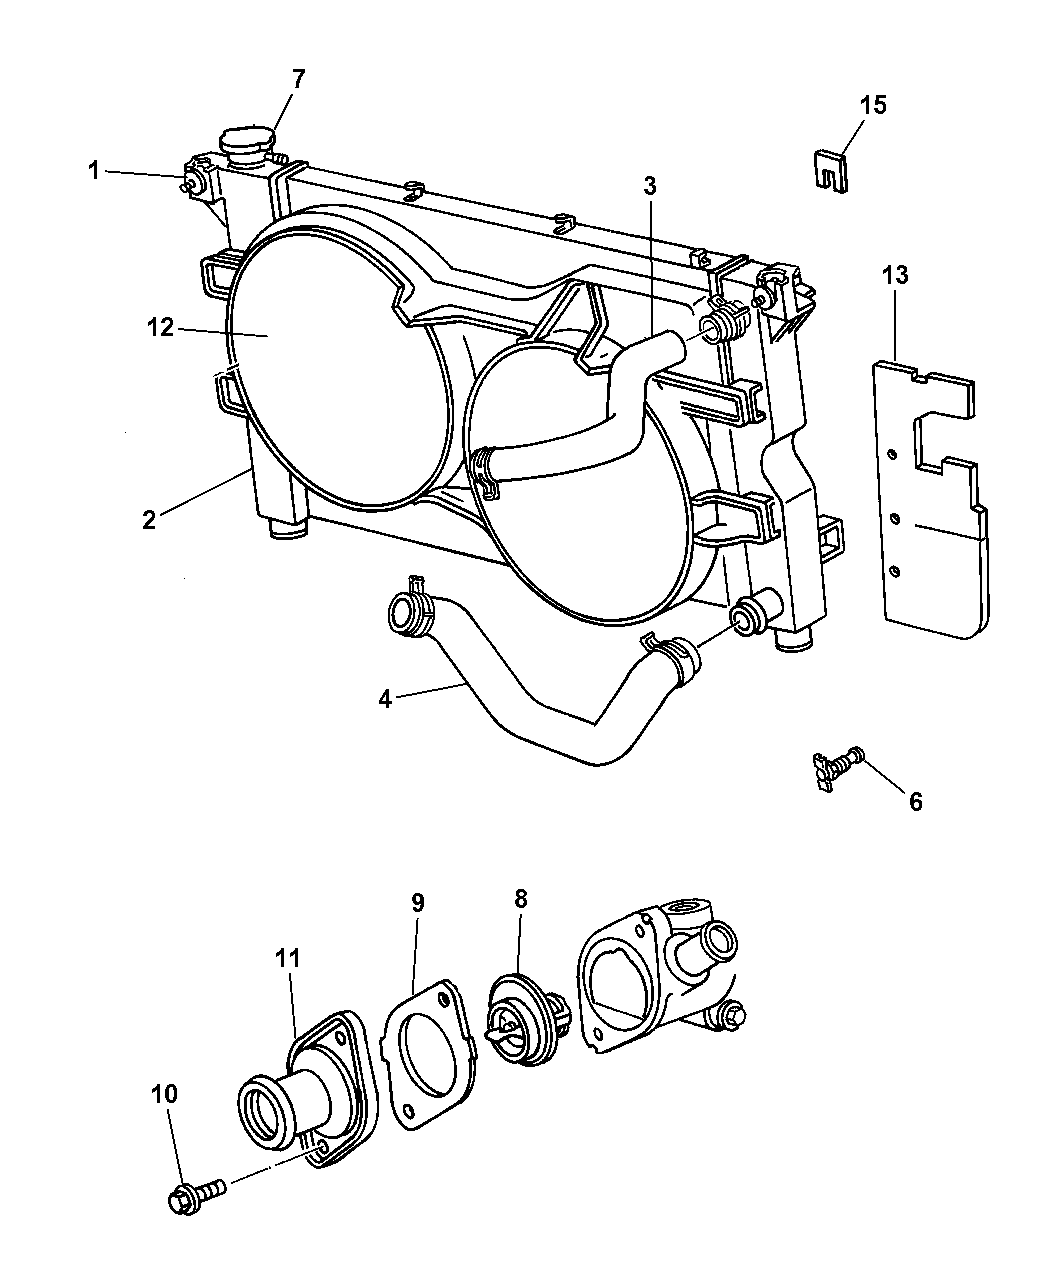 4677494aa Genuine Mopar Radiator Engine Cooling 2004 Dodge Caravan Schematics Grand Related Parts